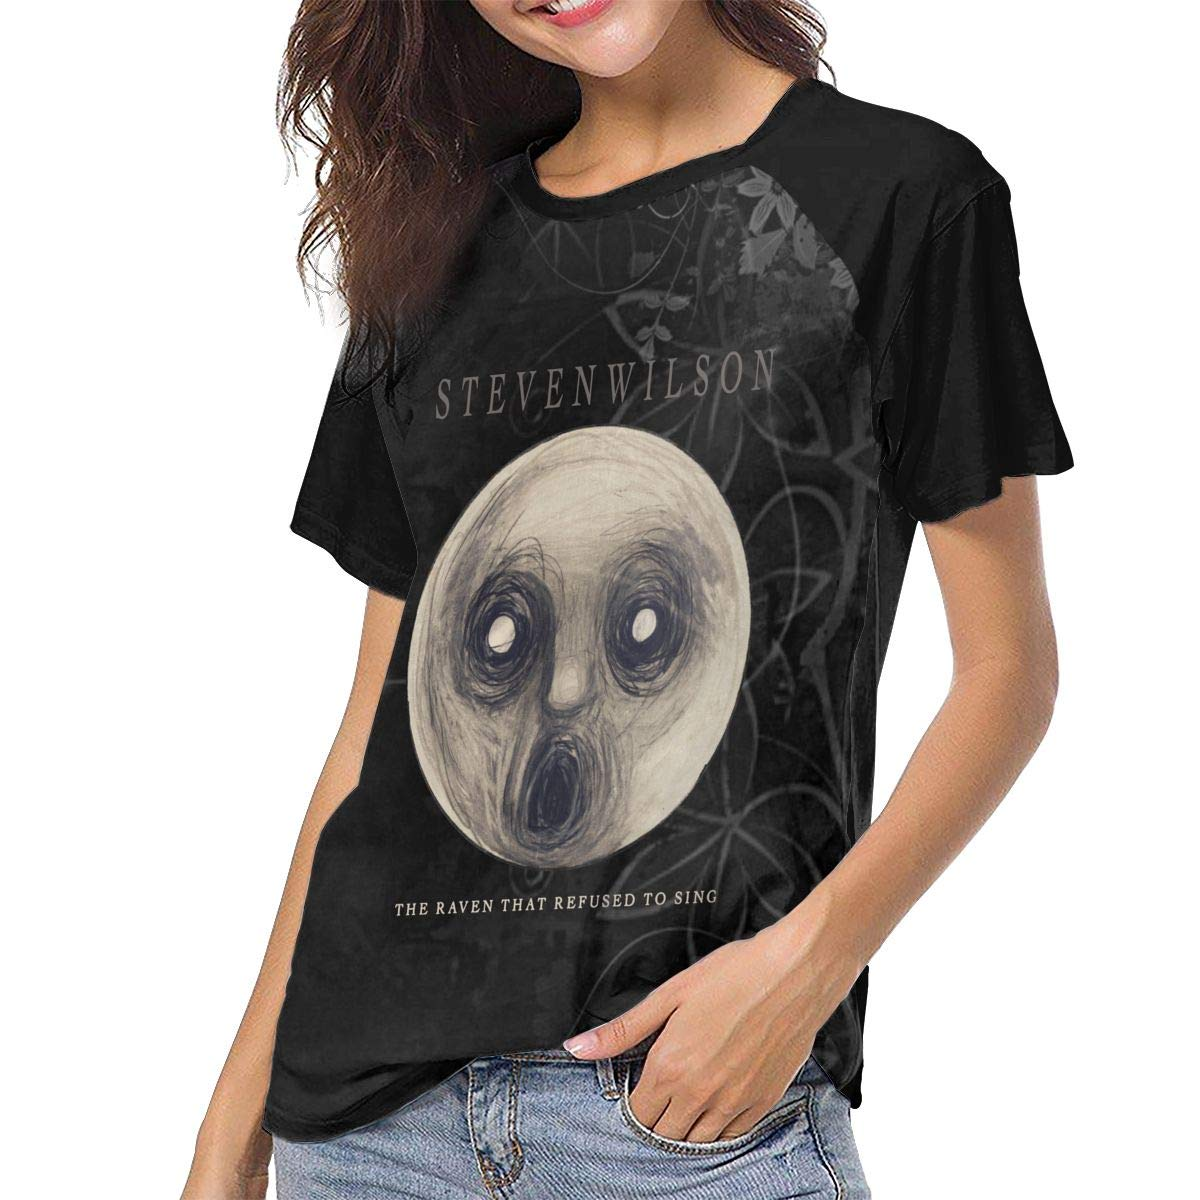 Mabb Steven Wilson The Raven That Refused to Sing Womens Short Sleeve Raglan Baseball T-Shirts Black